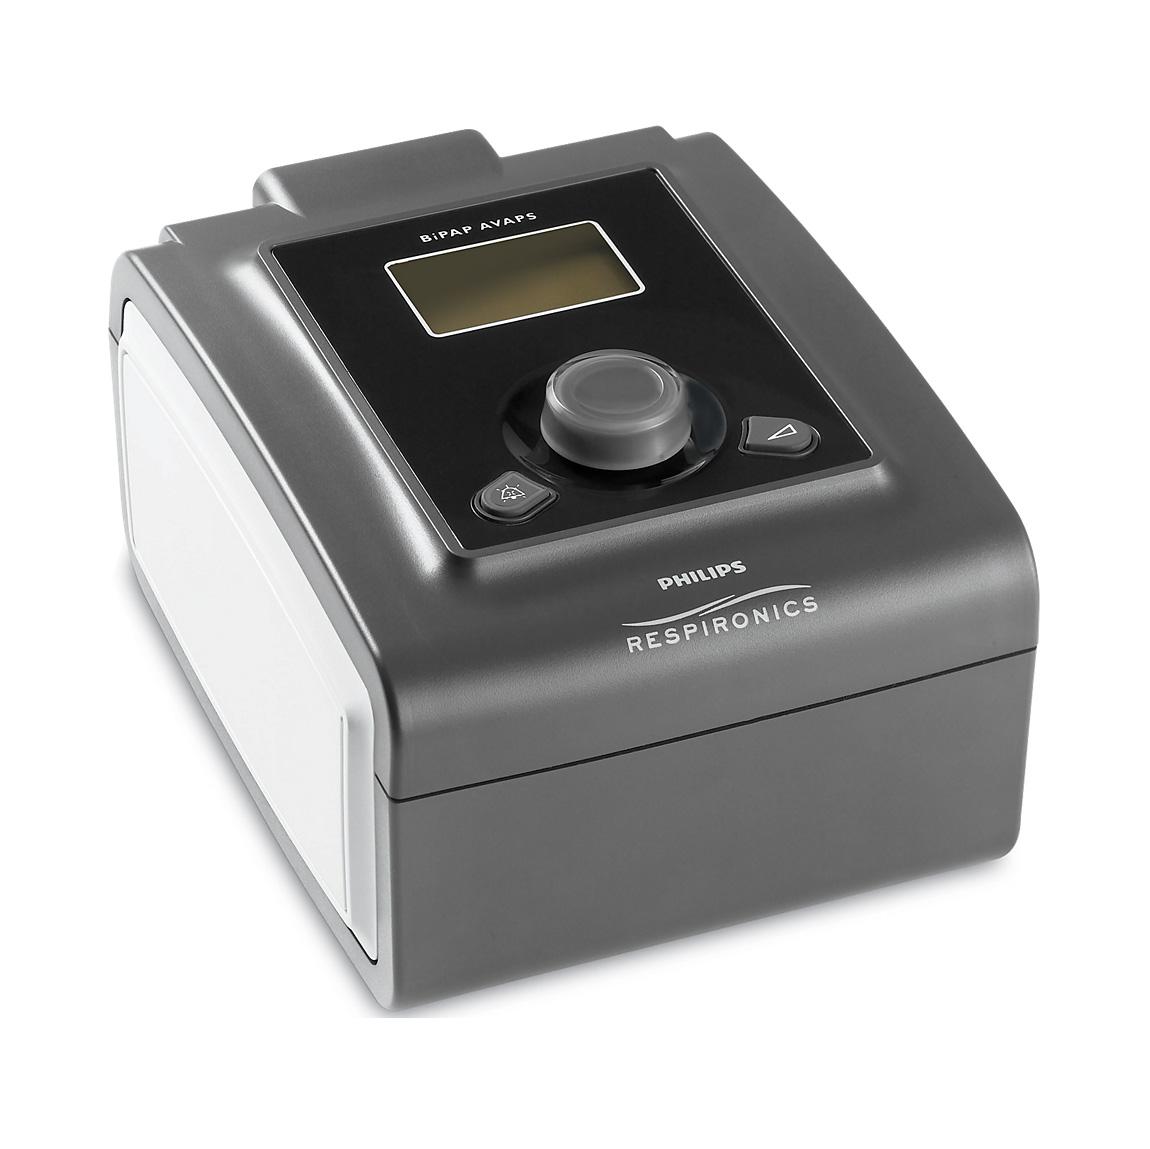 Respironics AVAPS Ventilator